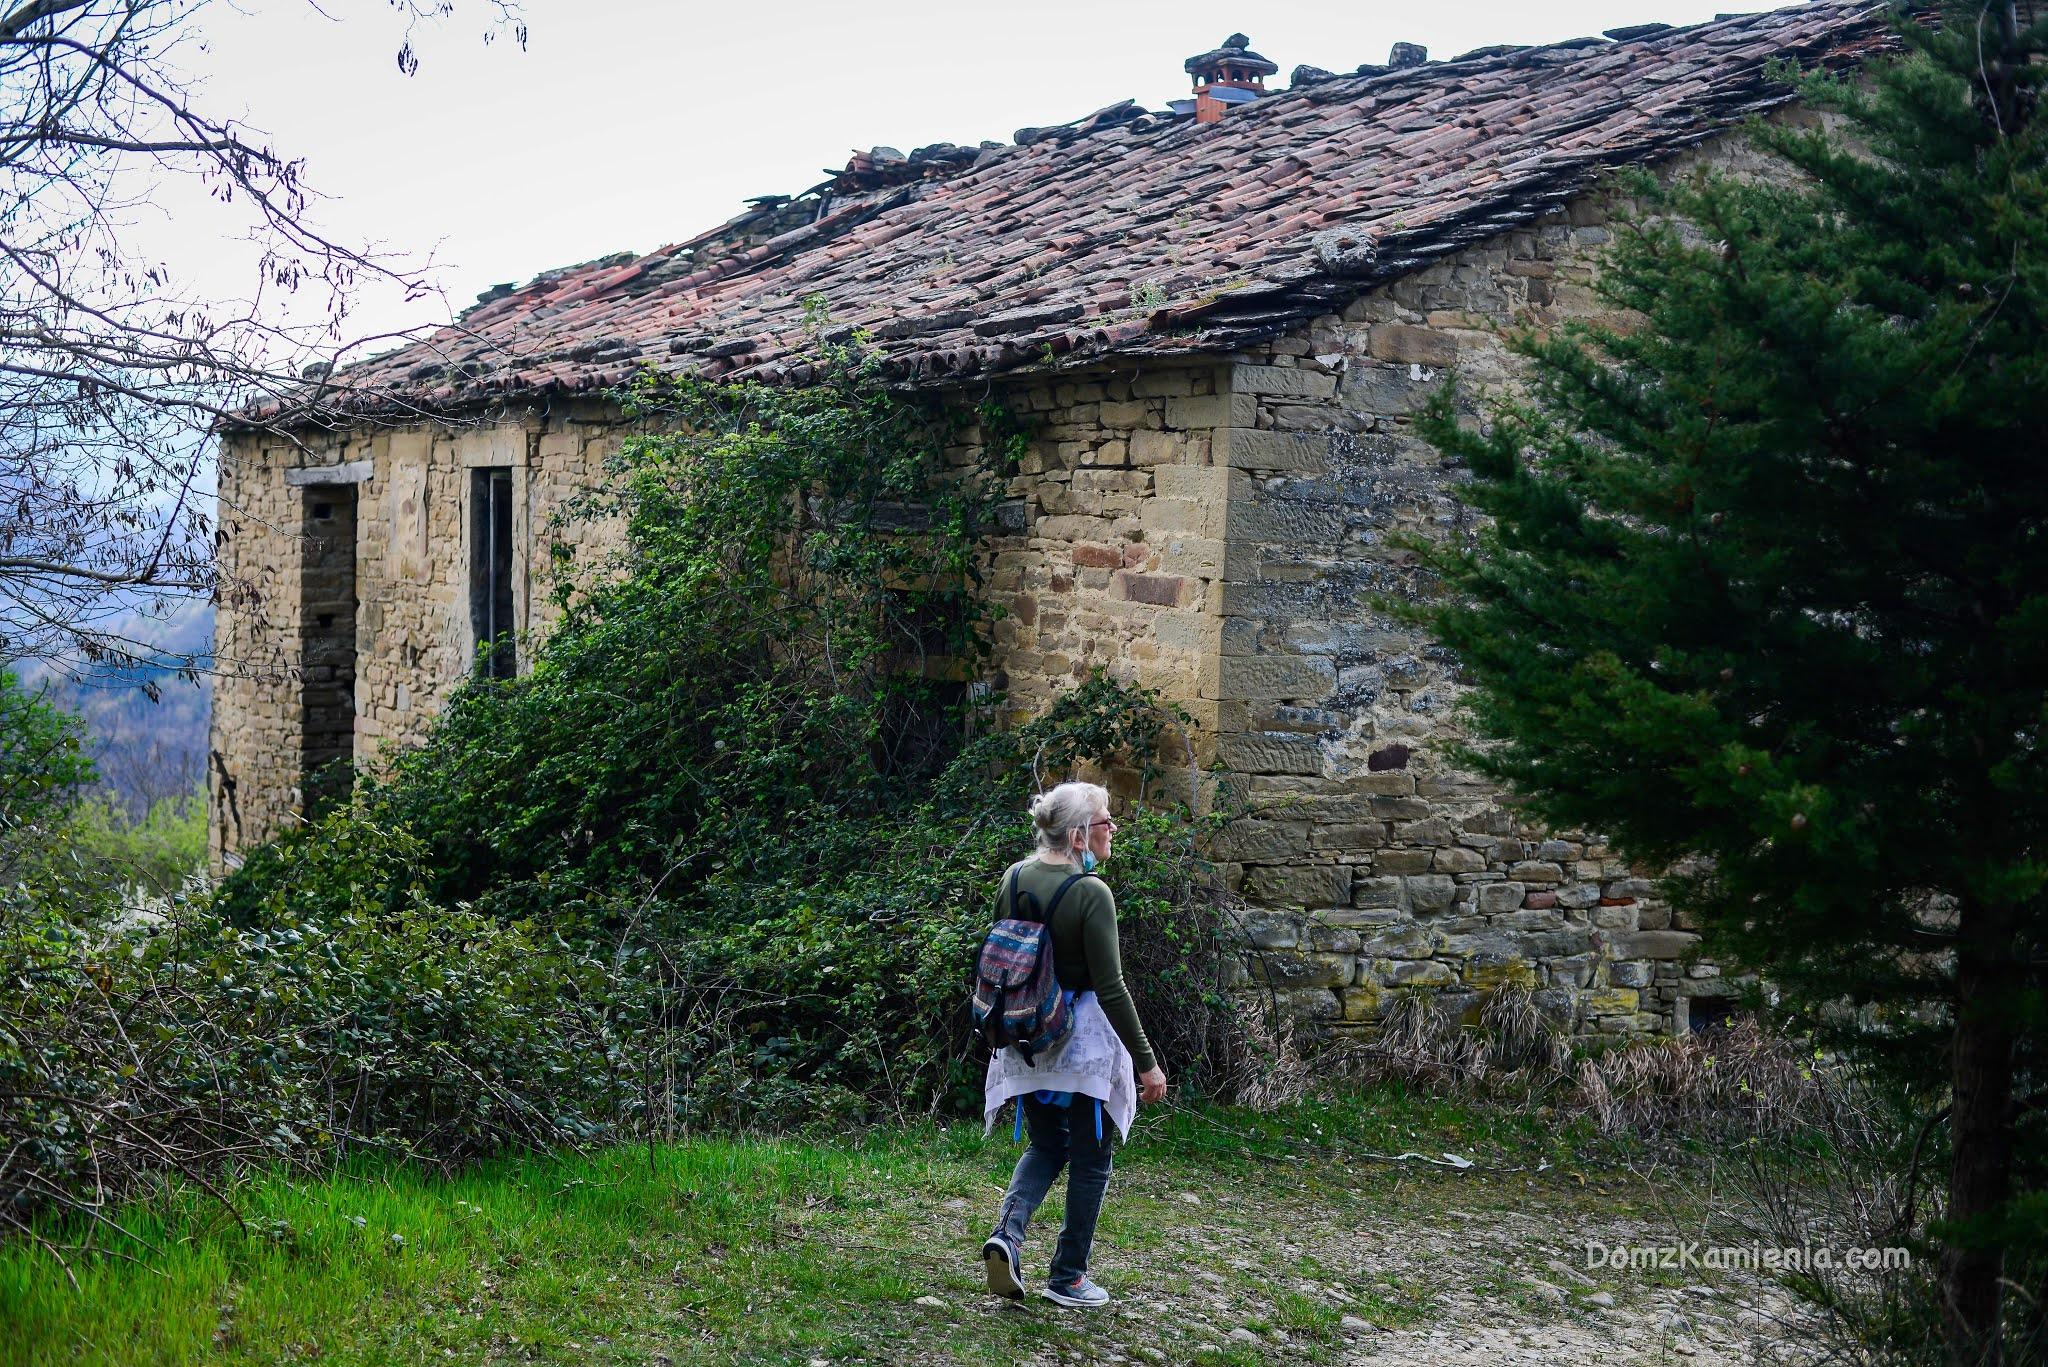 Trekking Toskania, Marradi, Dom z Kamienia blog